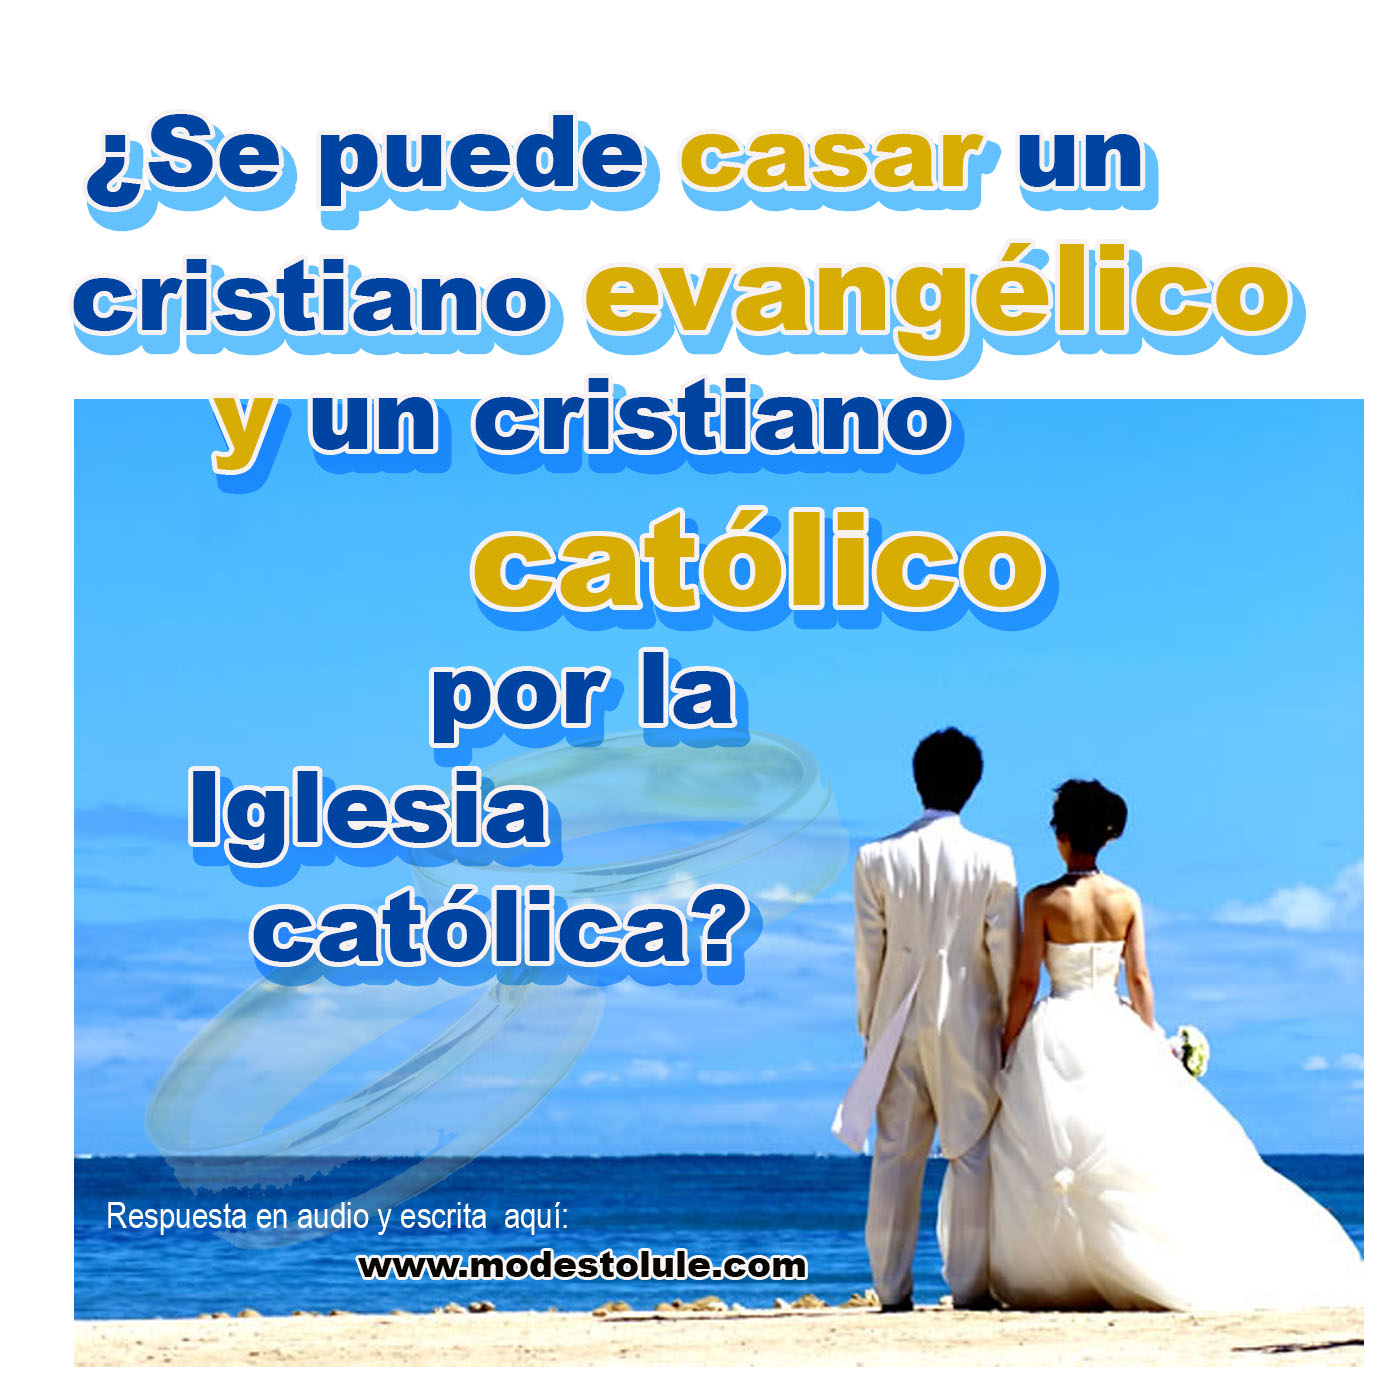 Matrimonio Catolico Y Cristiano : Podcast´s católico puede un cristiano evangélico casarse